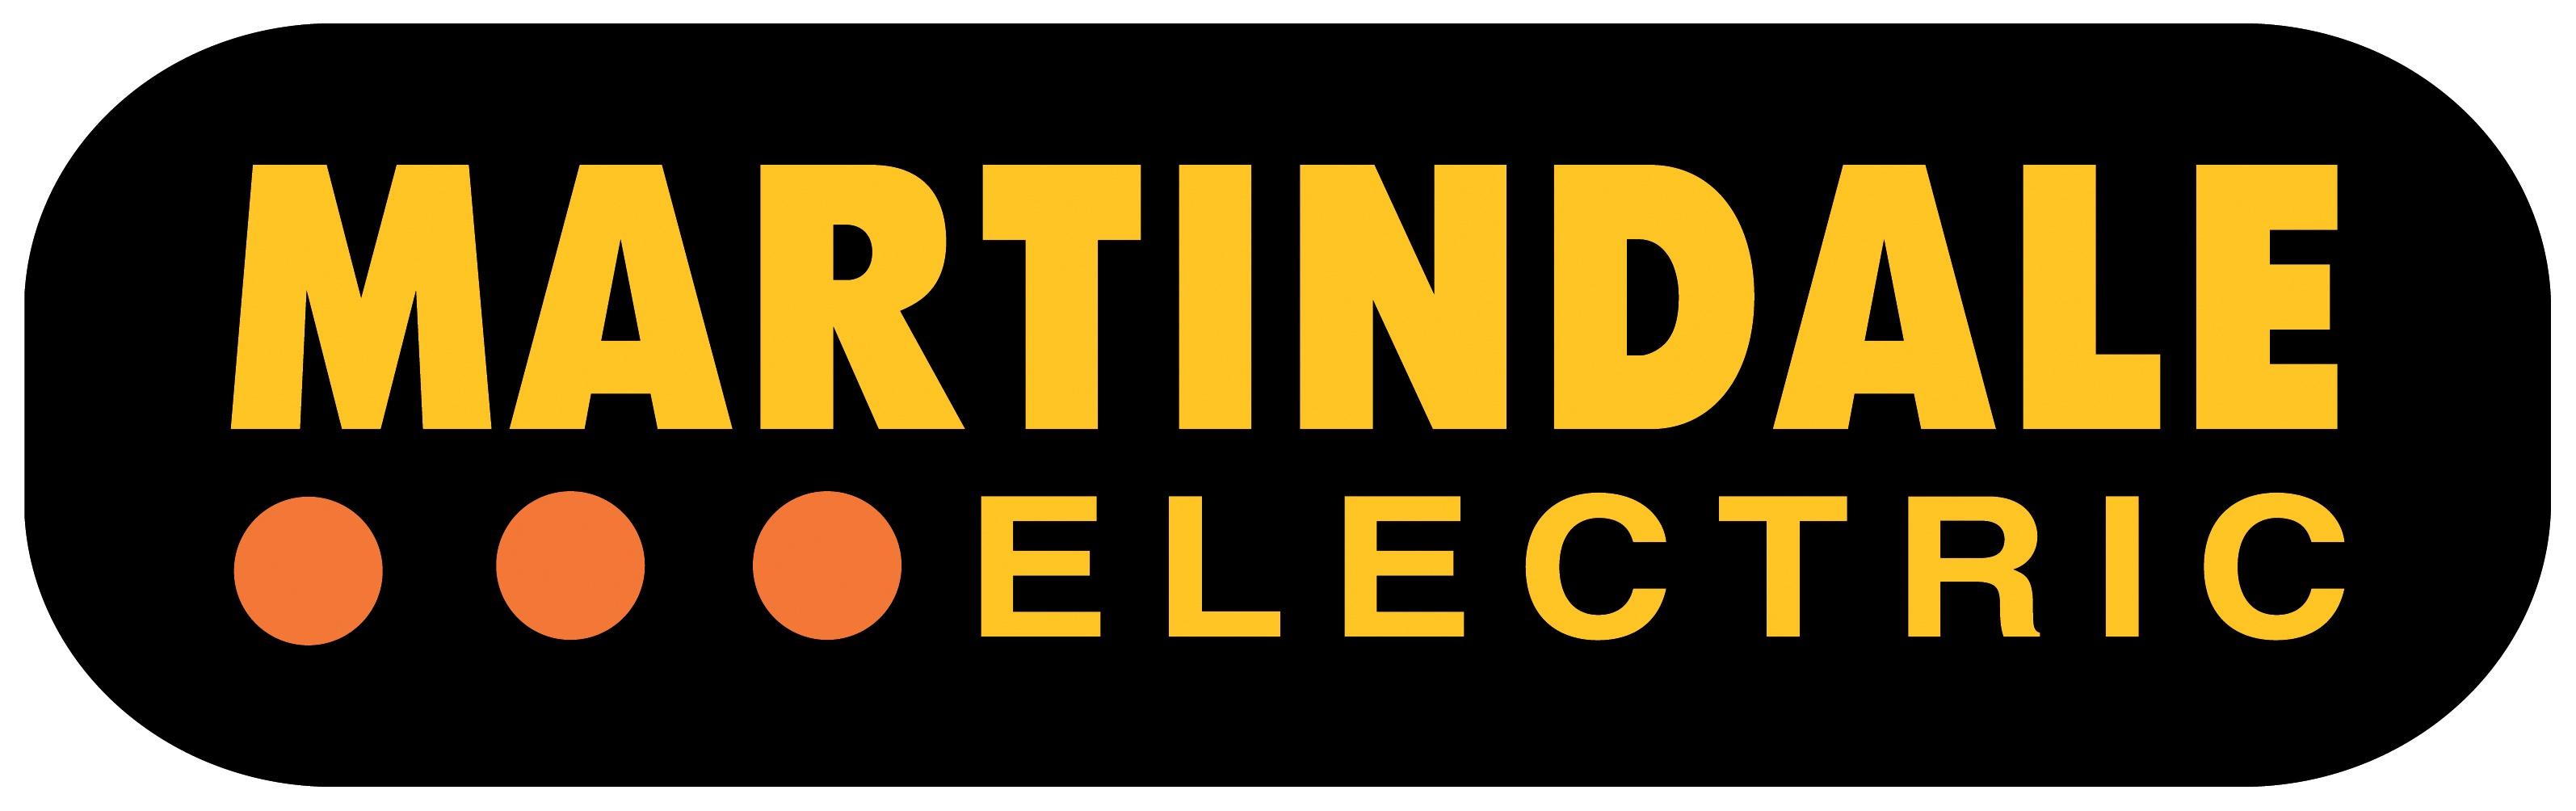 Martindale logo new rgb.jpg